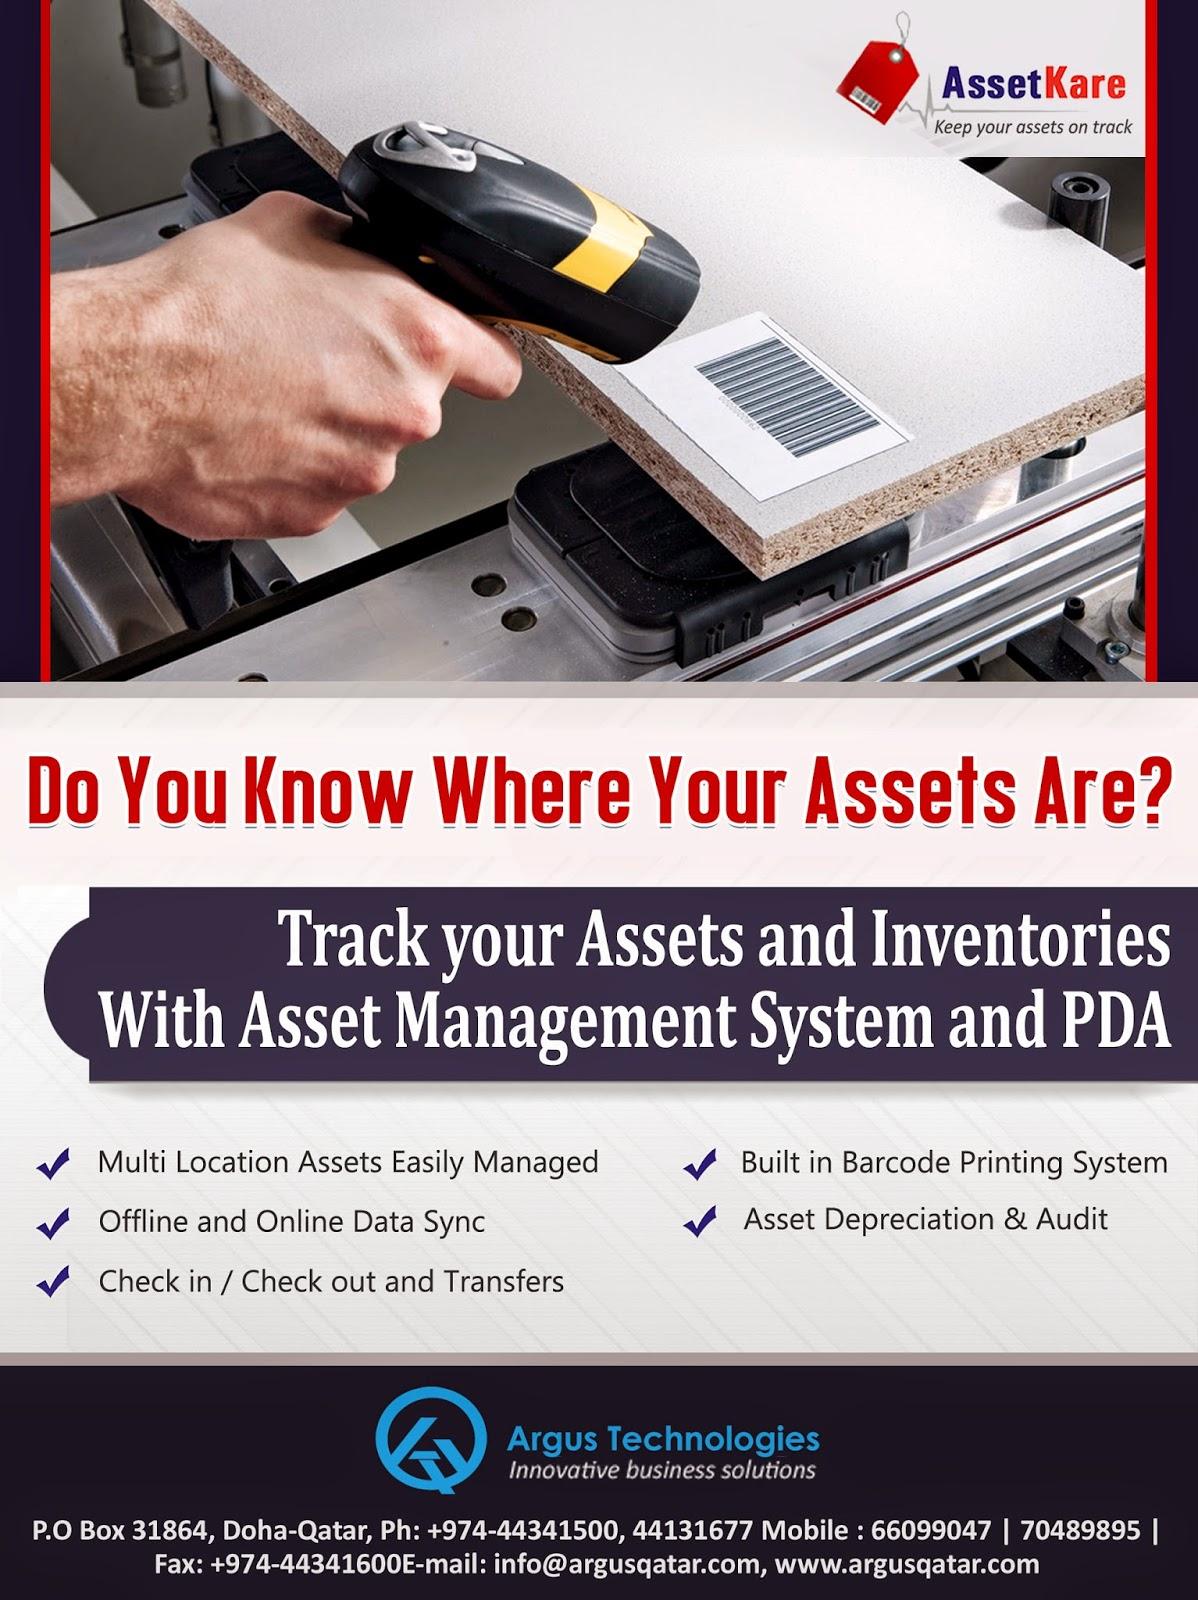 http://www.argusqatar.com/asset-tracking-system